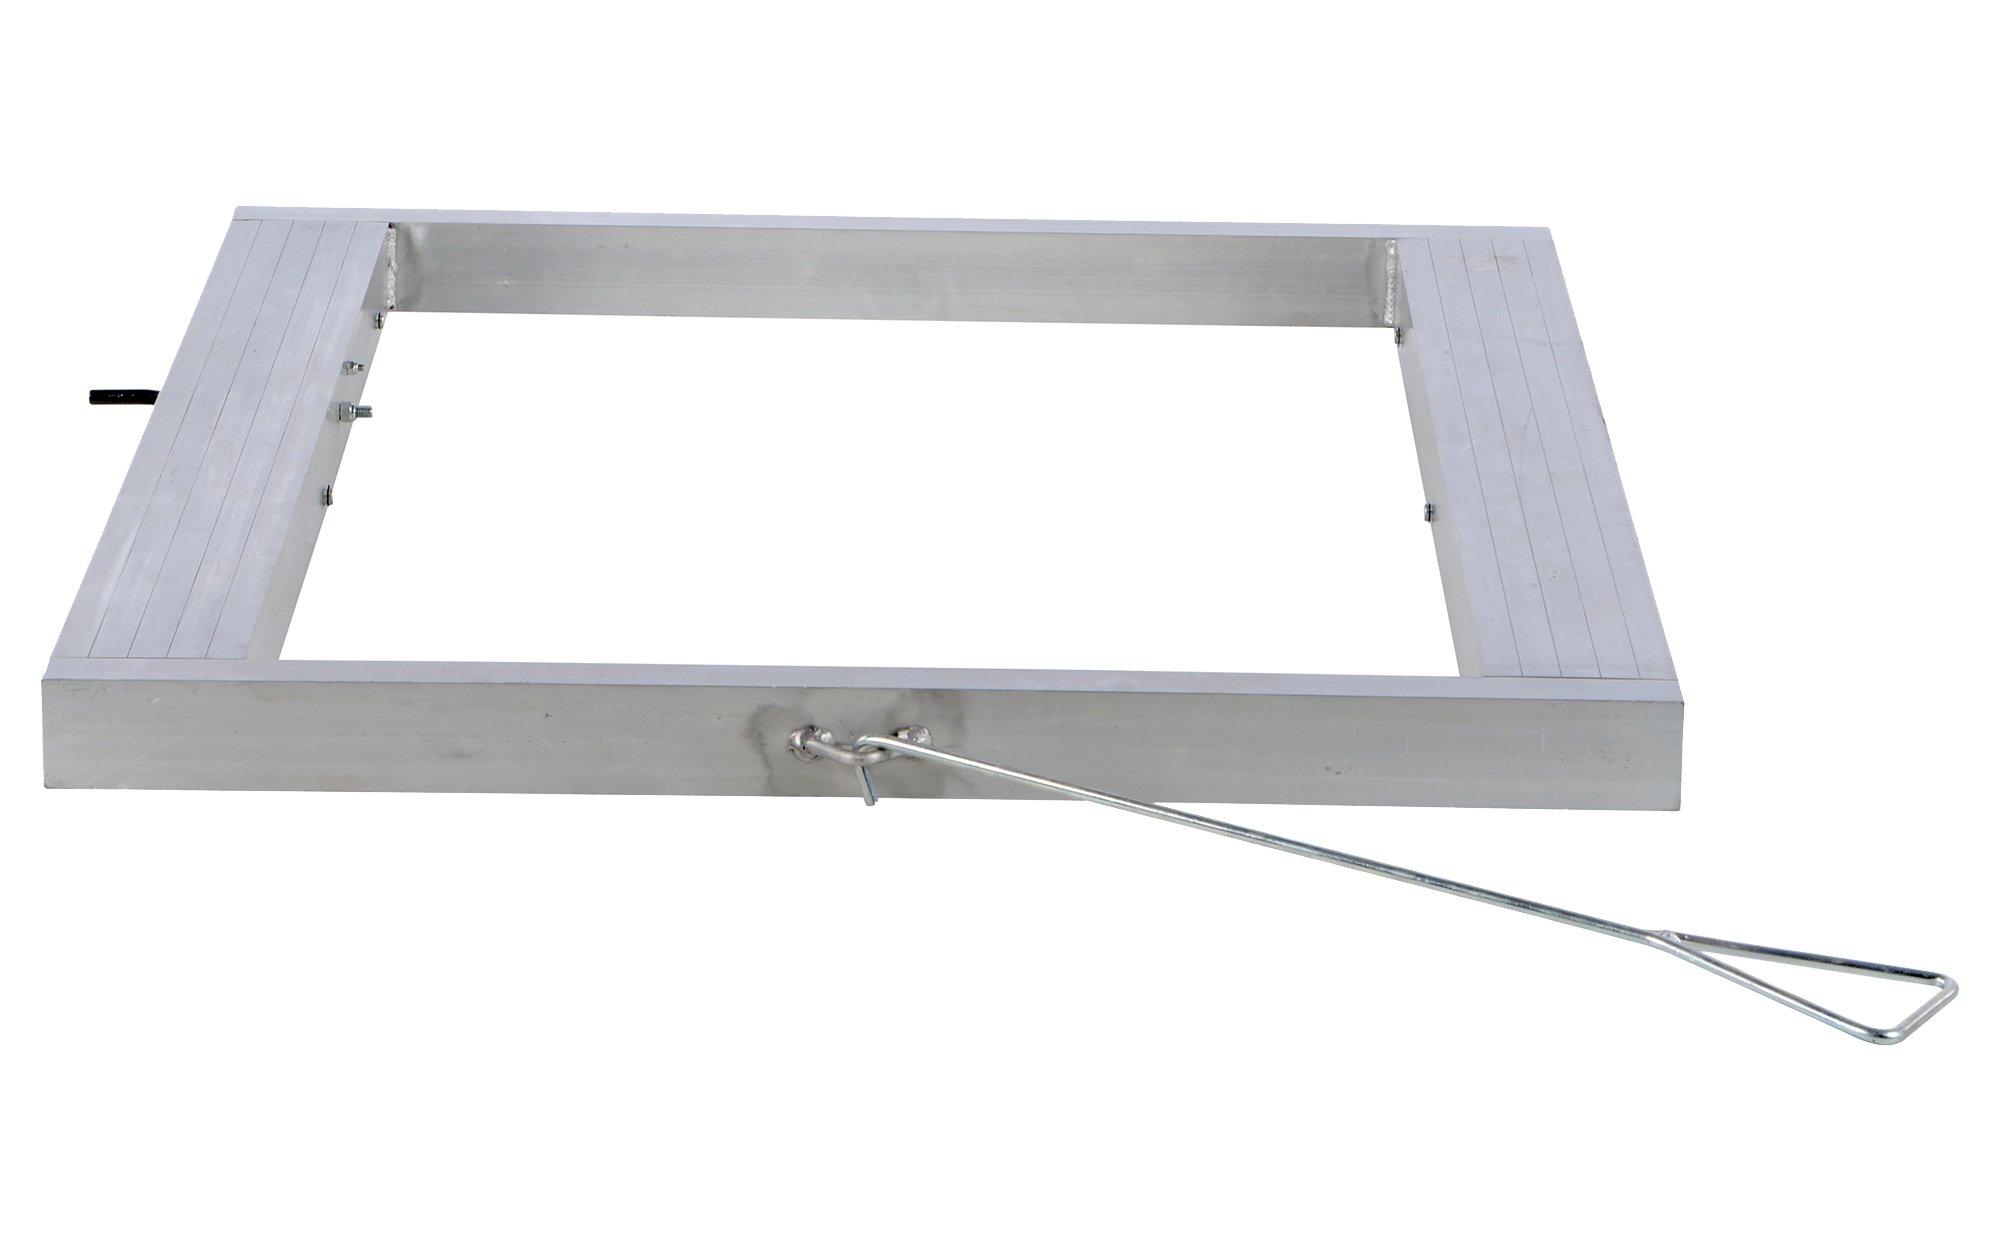 Vestil DOL-4848-6T Pallet Dolly, Tilting, Aluminum, 4,000 lb. Capacity, 4-1/8 x 48 x 48'' by Vestil (Image #1)